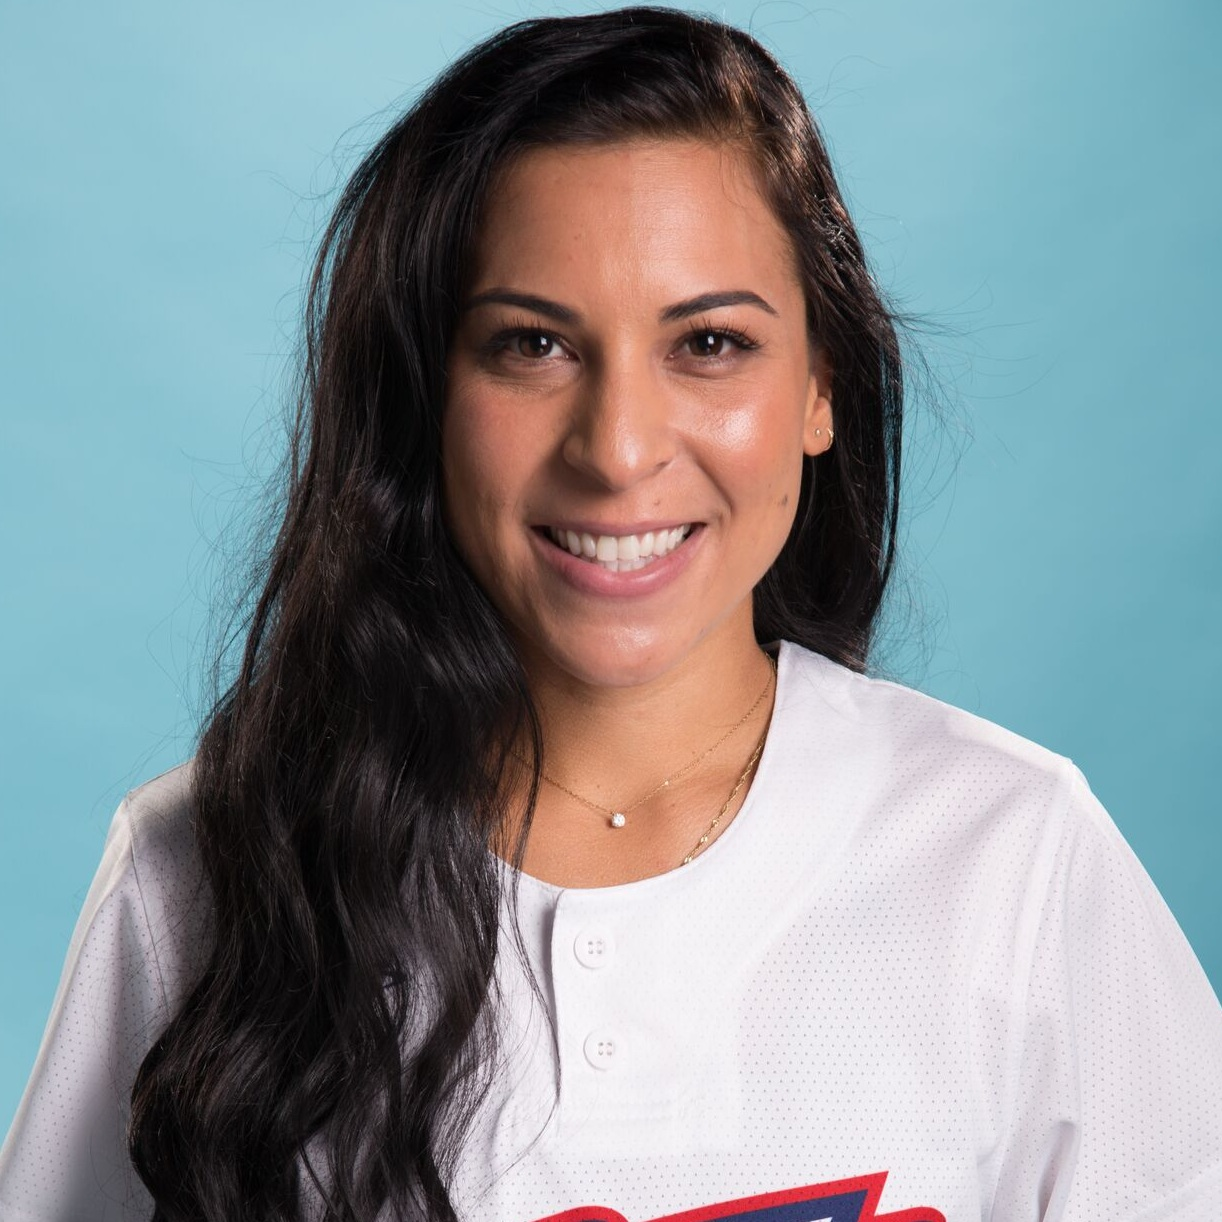 - Sierra Romero plays as an infielder for the USSSA Pride